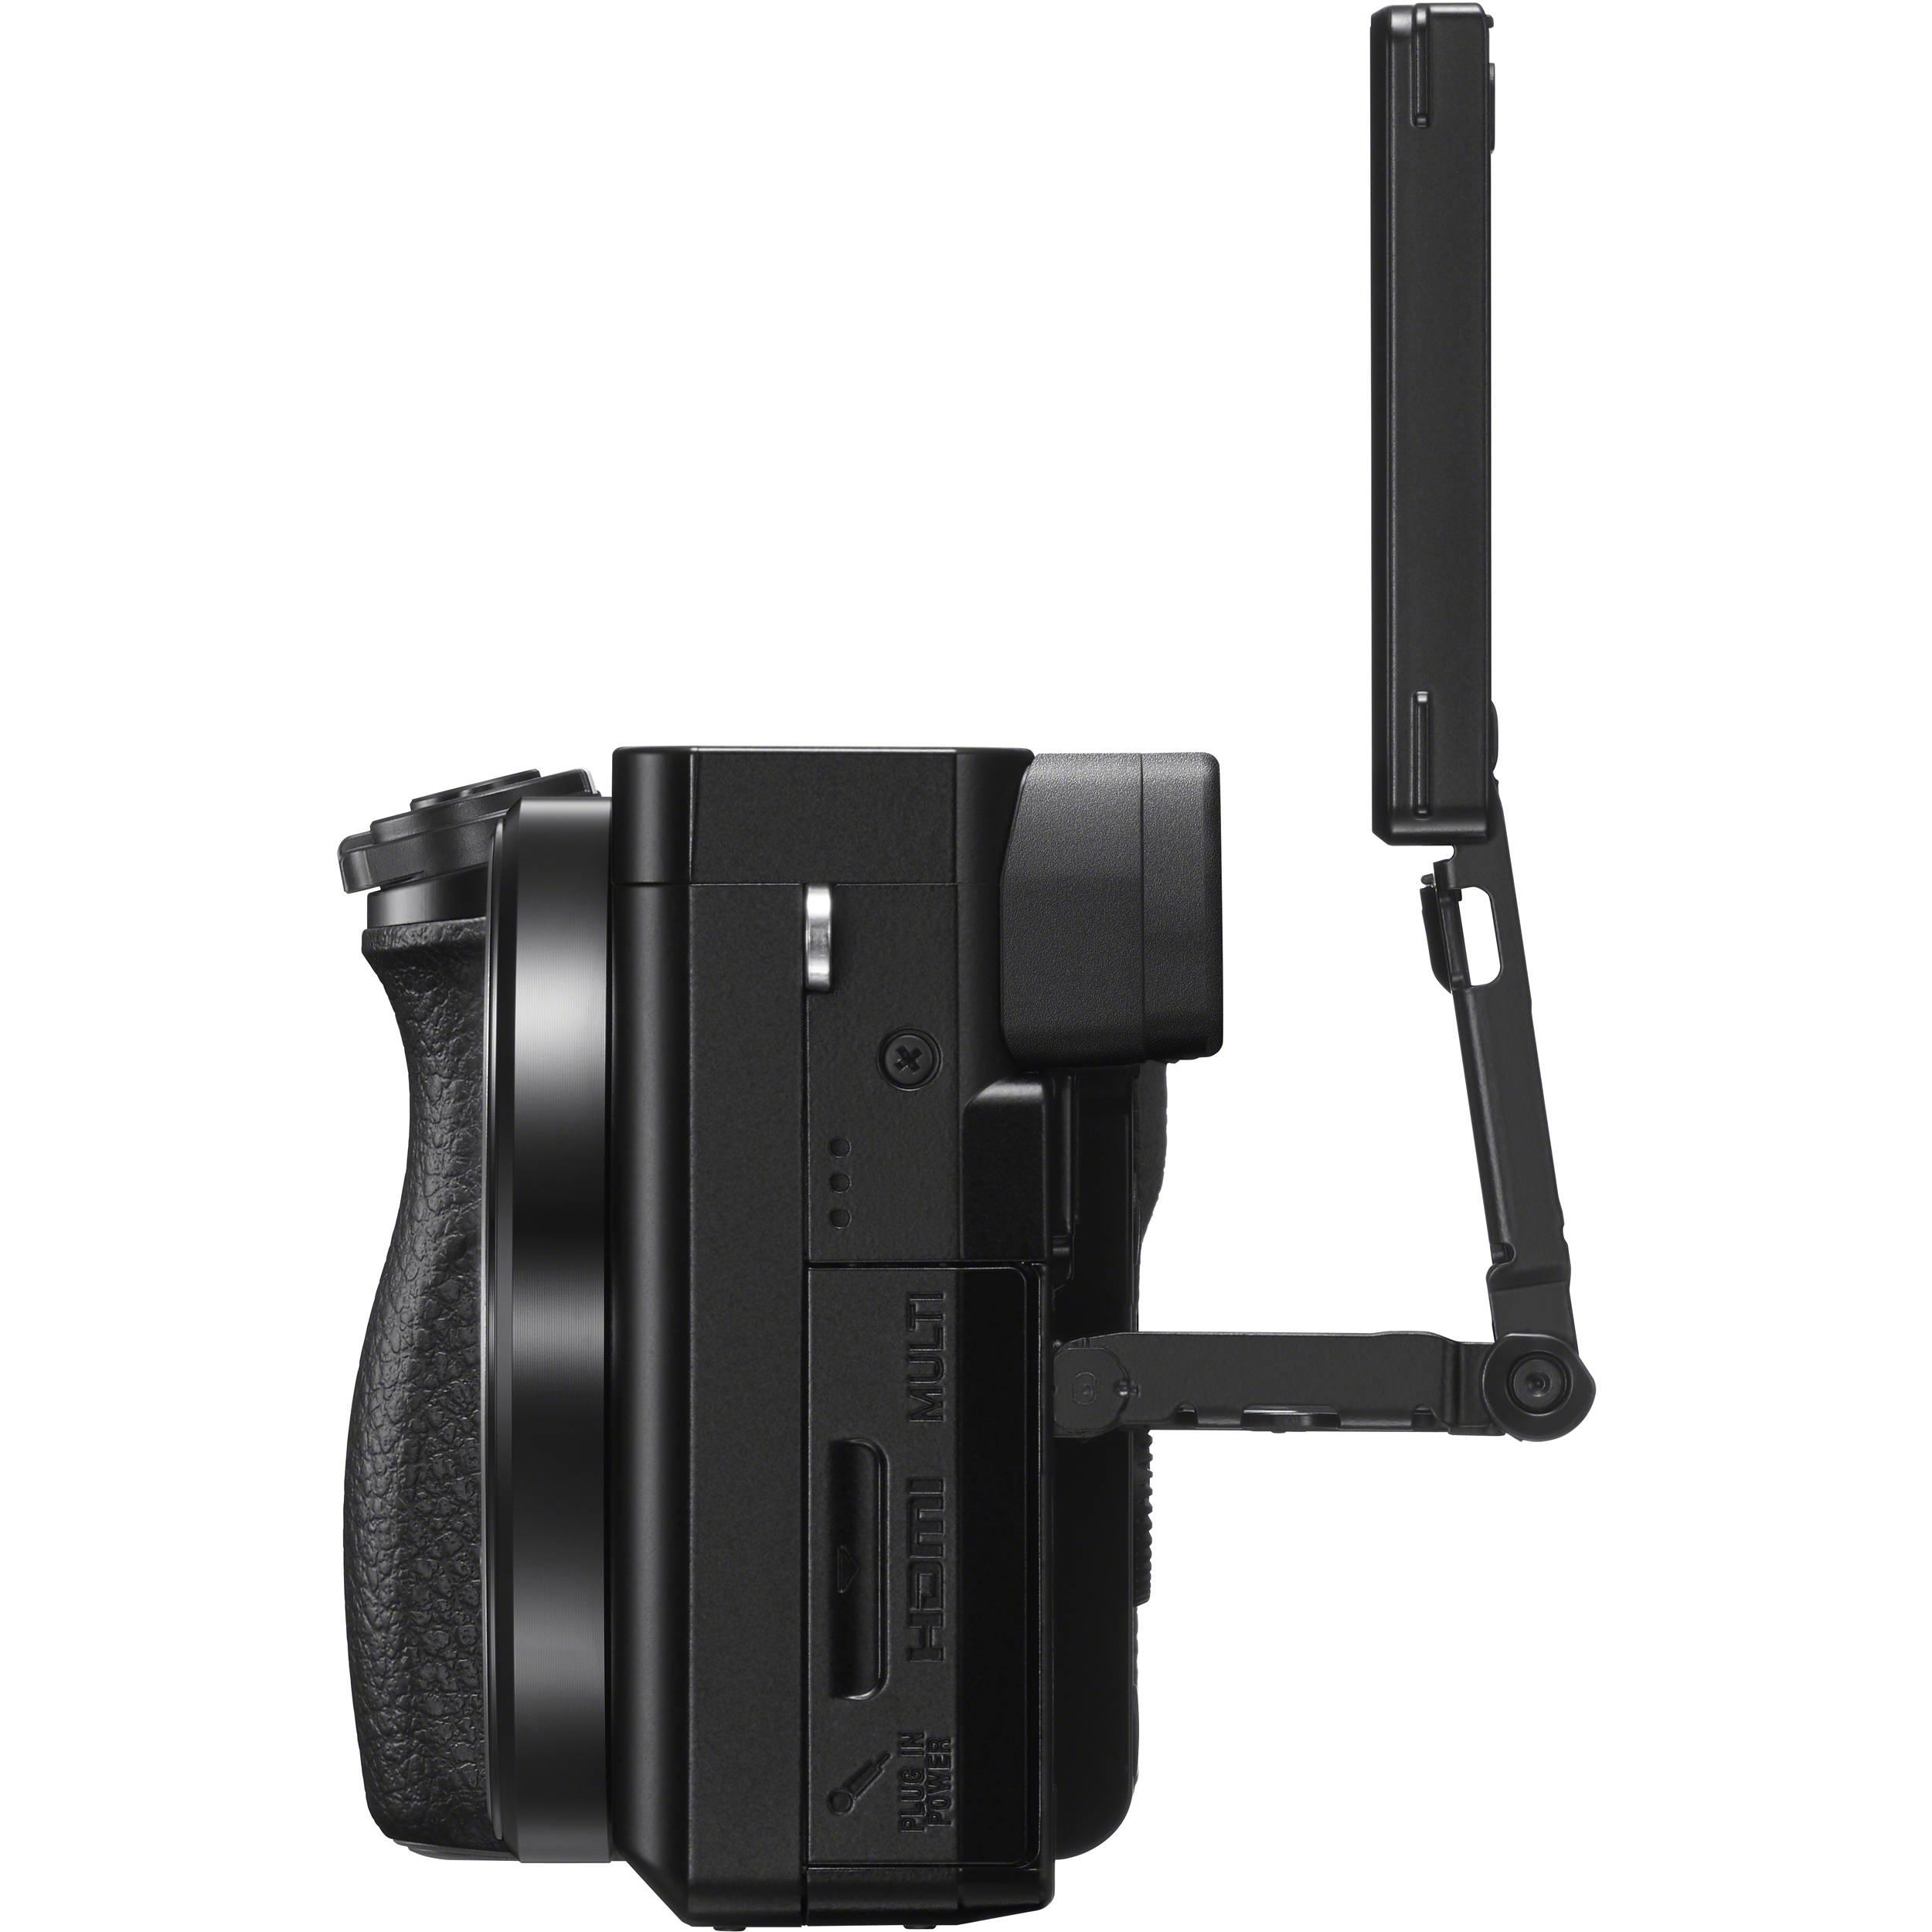 دوربین سونی مدل Alpha a6100 (بادی)